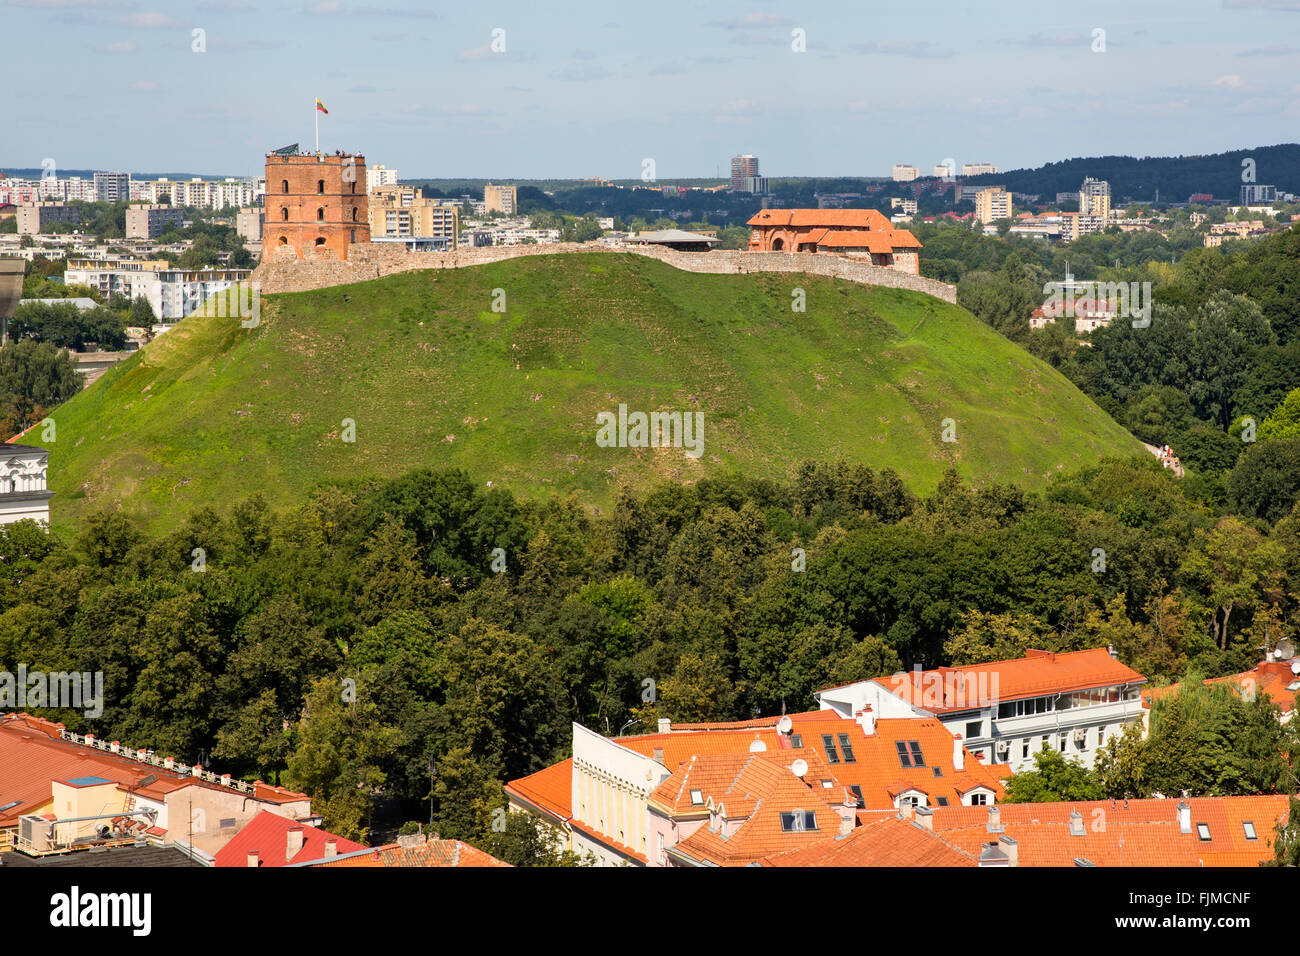 Geographie/Reisen, Litauen, Vilnius, Blick Richtung Schloss Gediminas, gedminas Tower, Additional-Rights - Clearance Stockbild